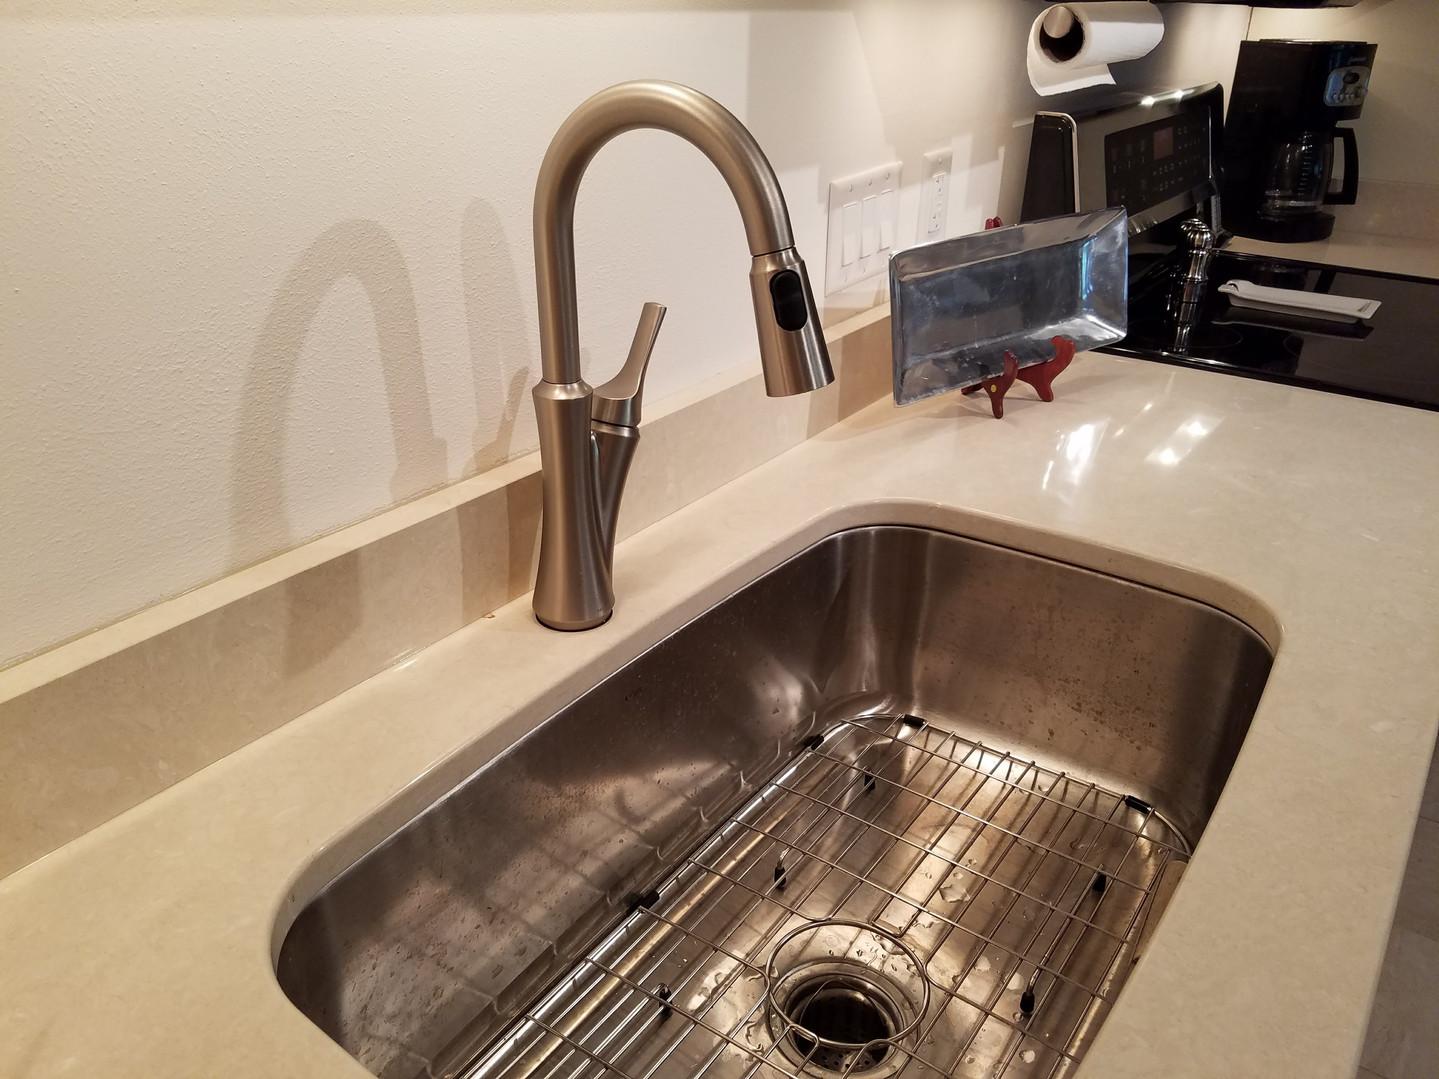 New Stainless Sink & Quartz Tops